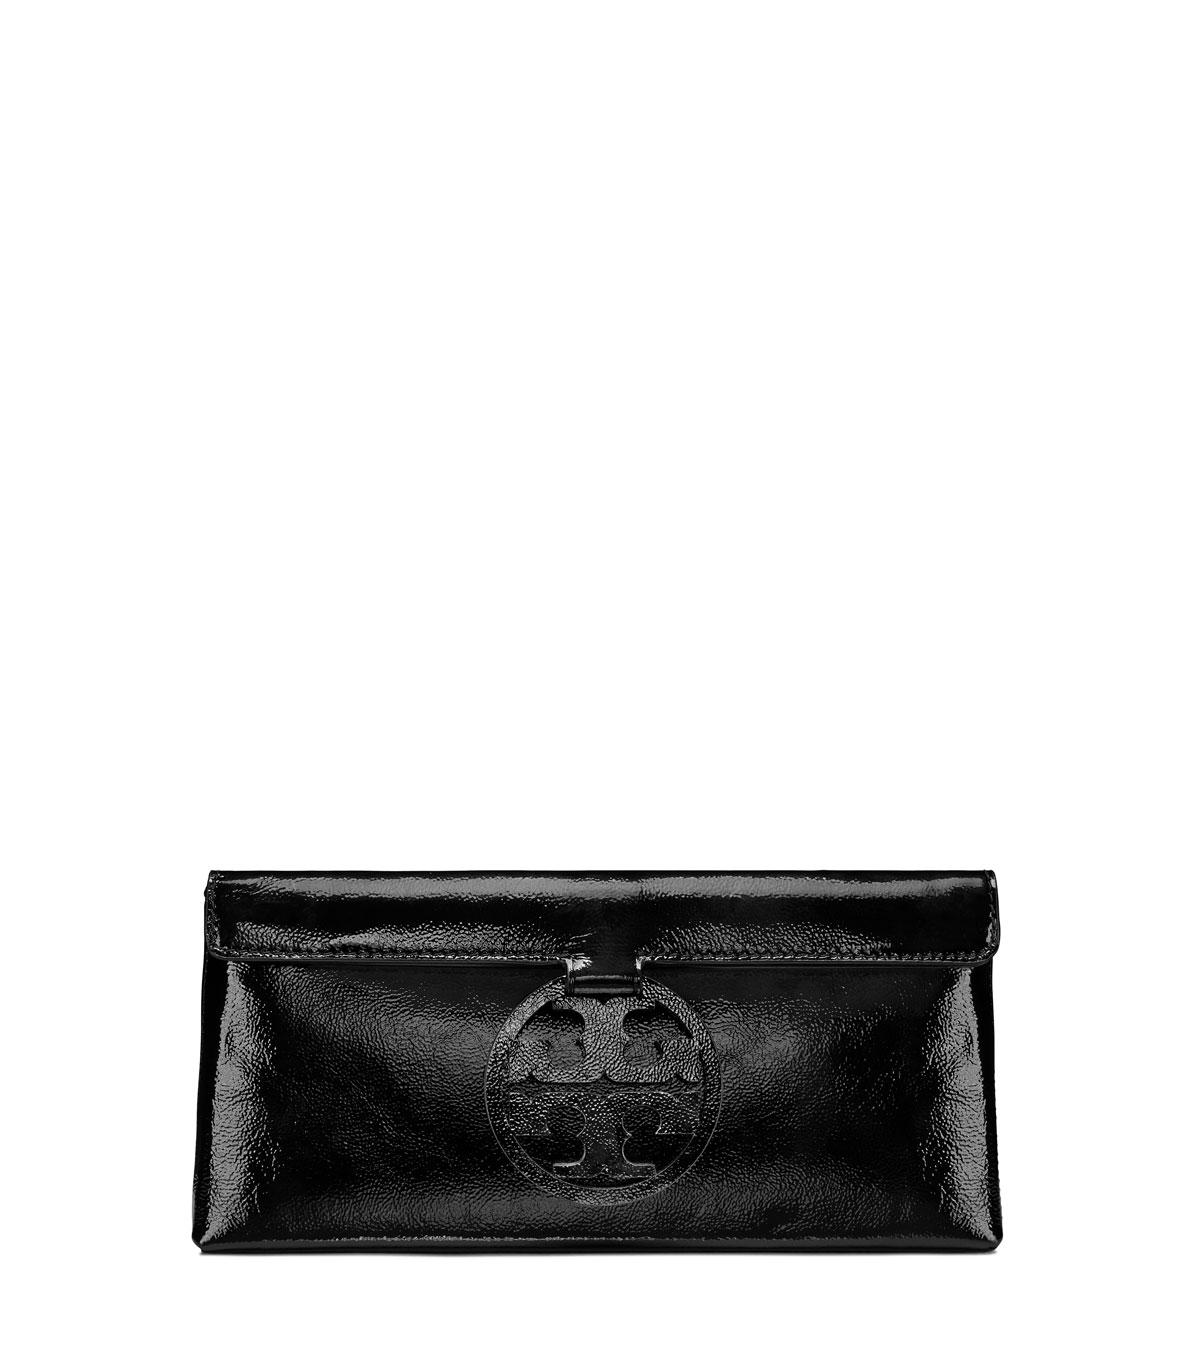 61cf0f5b155 Tory Burch Miller Patent Leather Clutch Bag